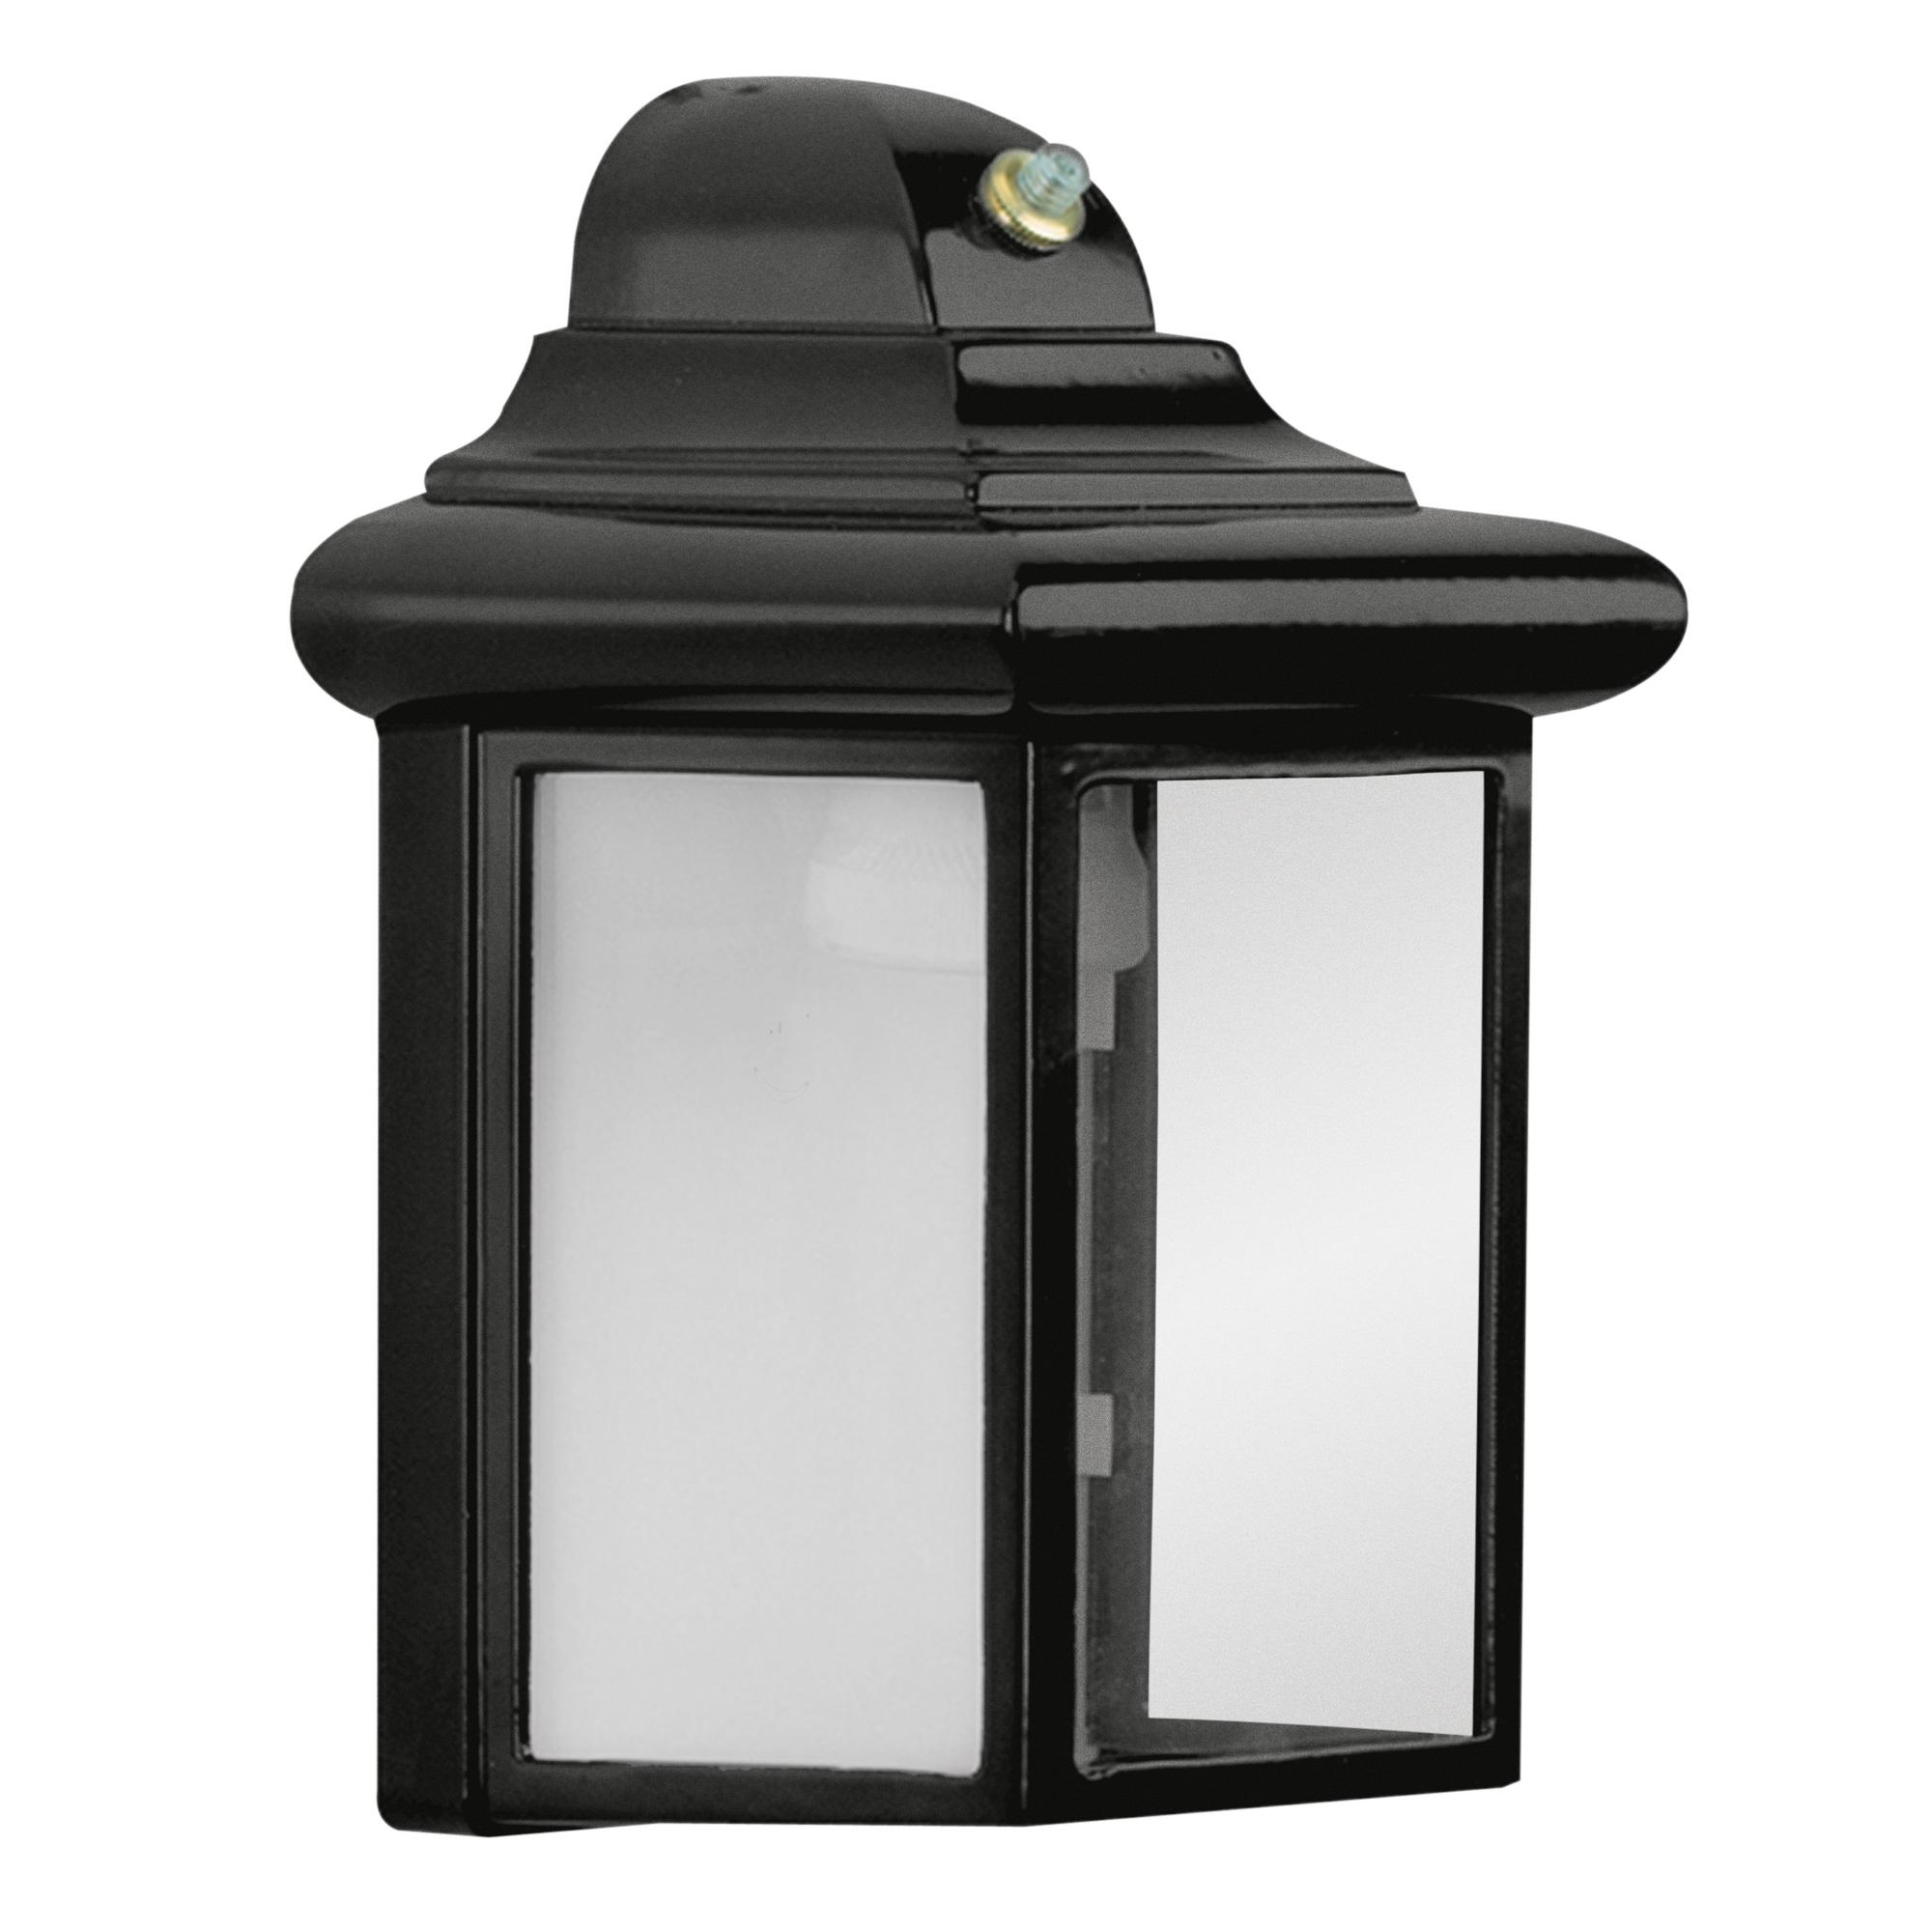 Super Muurlamp Bornand | Officiële site KS Verlichting PJ45